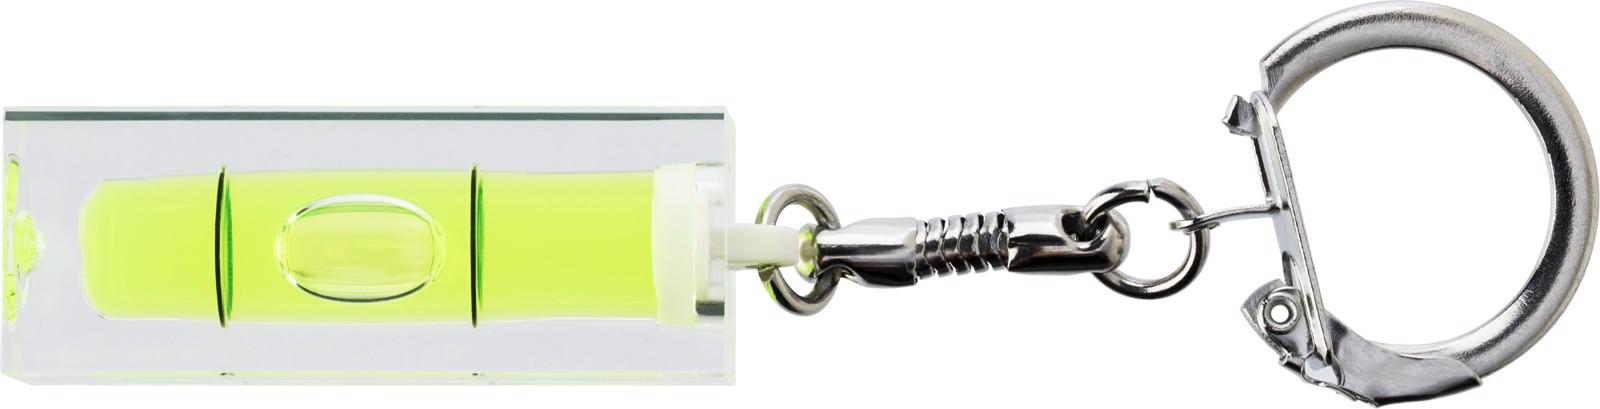 PET 2-in-1 key holder